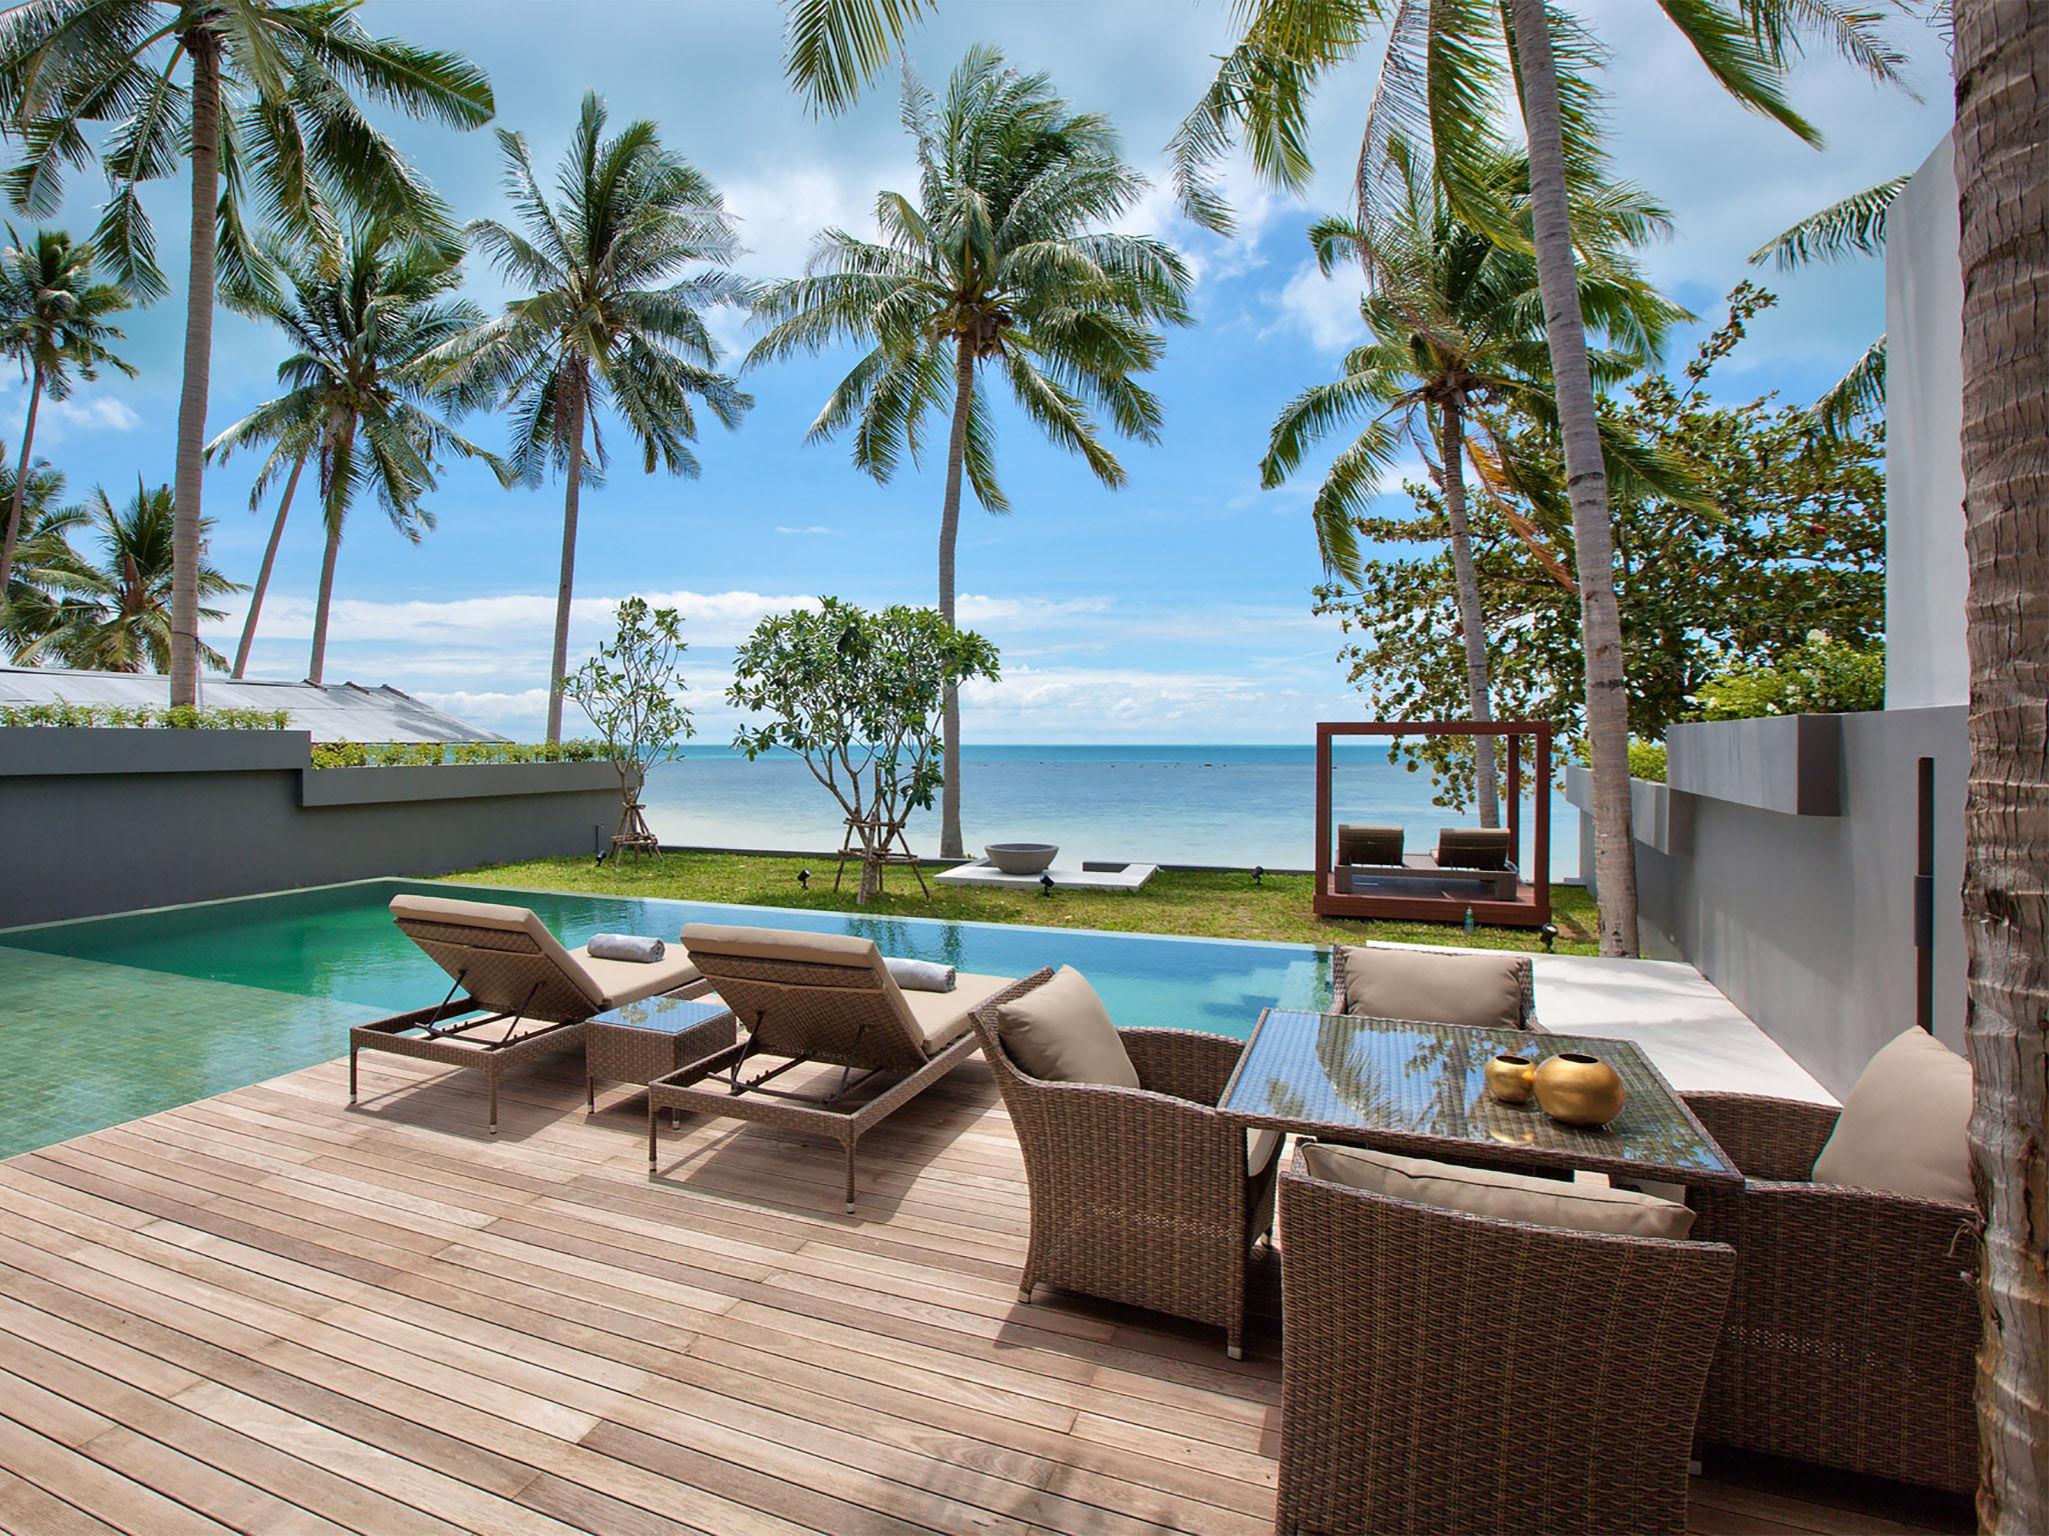 Villa Neung at Mandalay Beach Villas - Truly tropical sanctuary